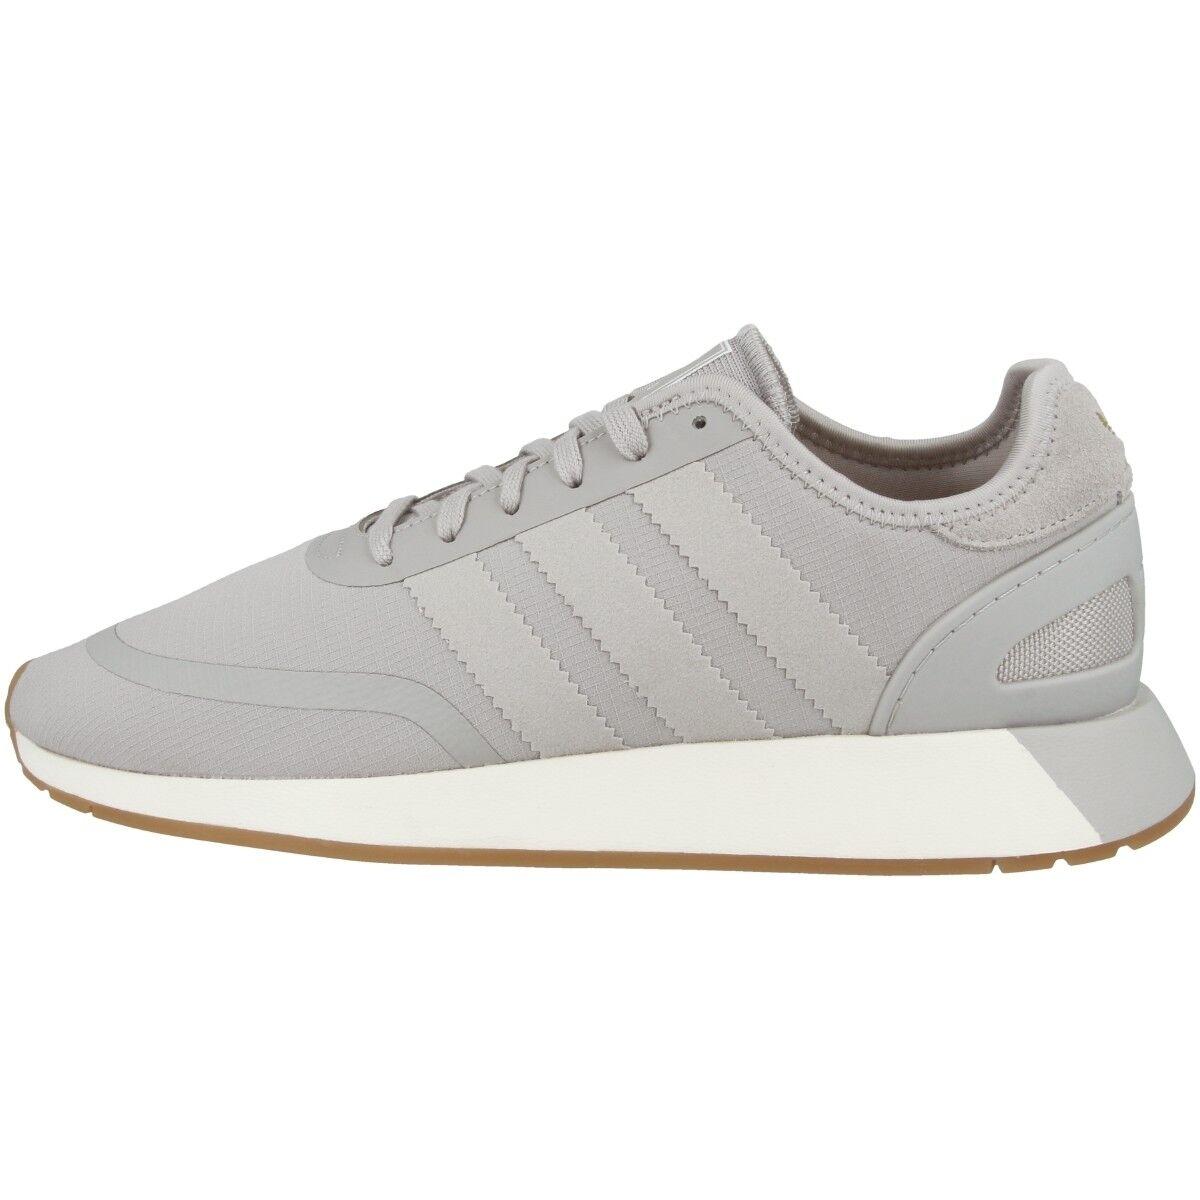 Adidas N-5923 damen Schuhe Damen Originals Turnschuhe Turnschuhe Turnschuhe Turnschuhe grau gum B37167 5d2e16